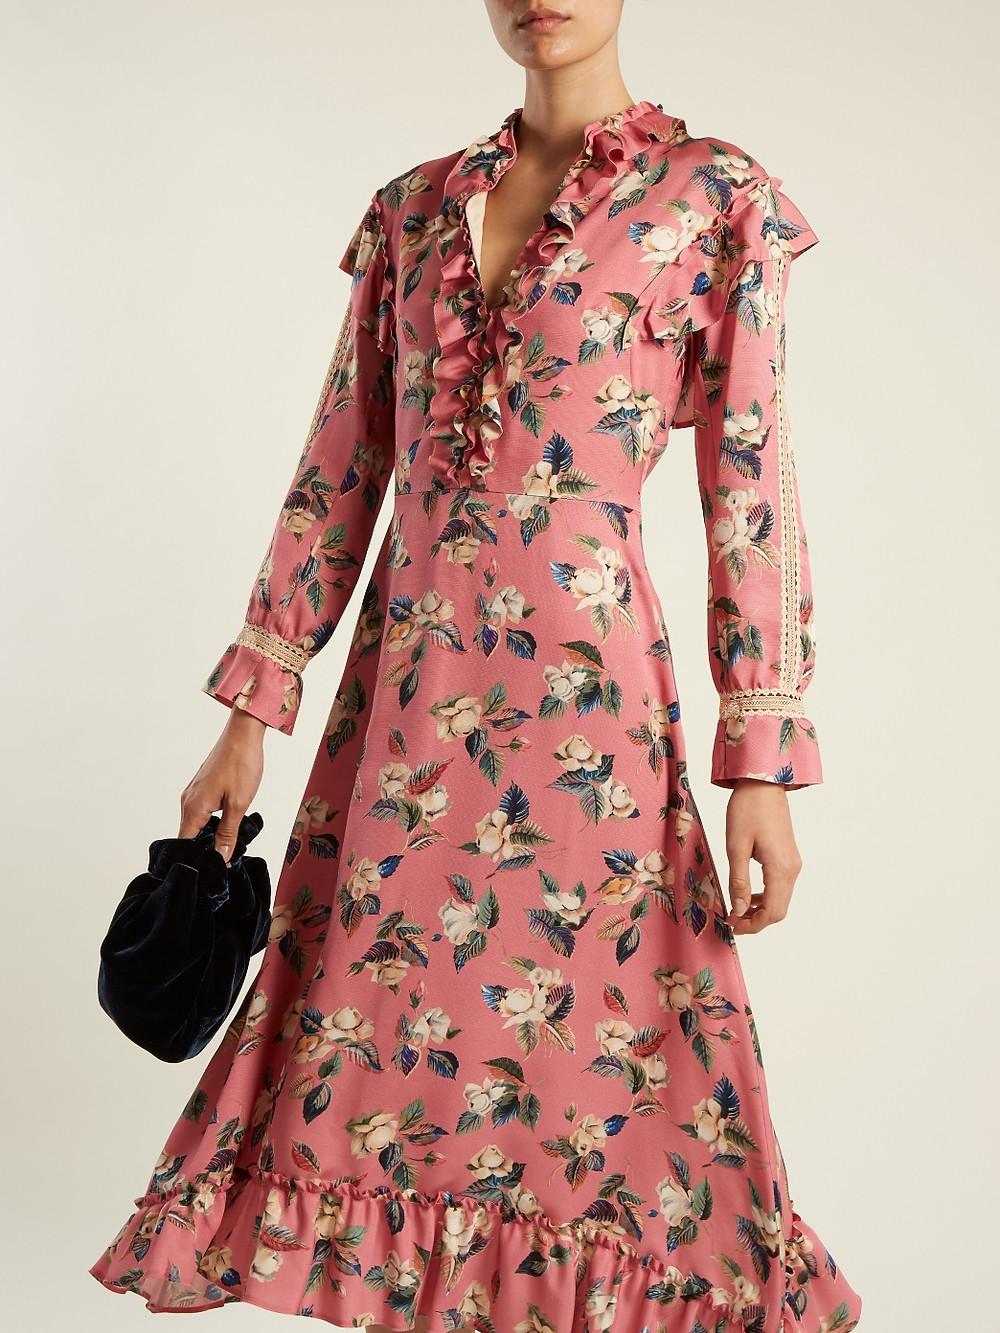 Vilshenko Palasha floral-print wool and silk-blend dress  $1,098